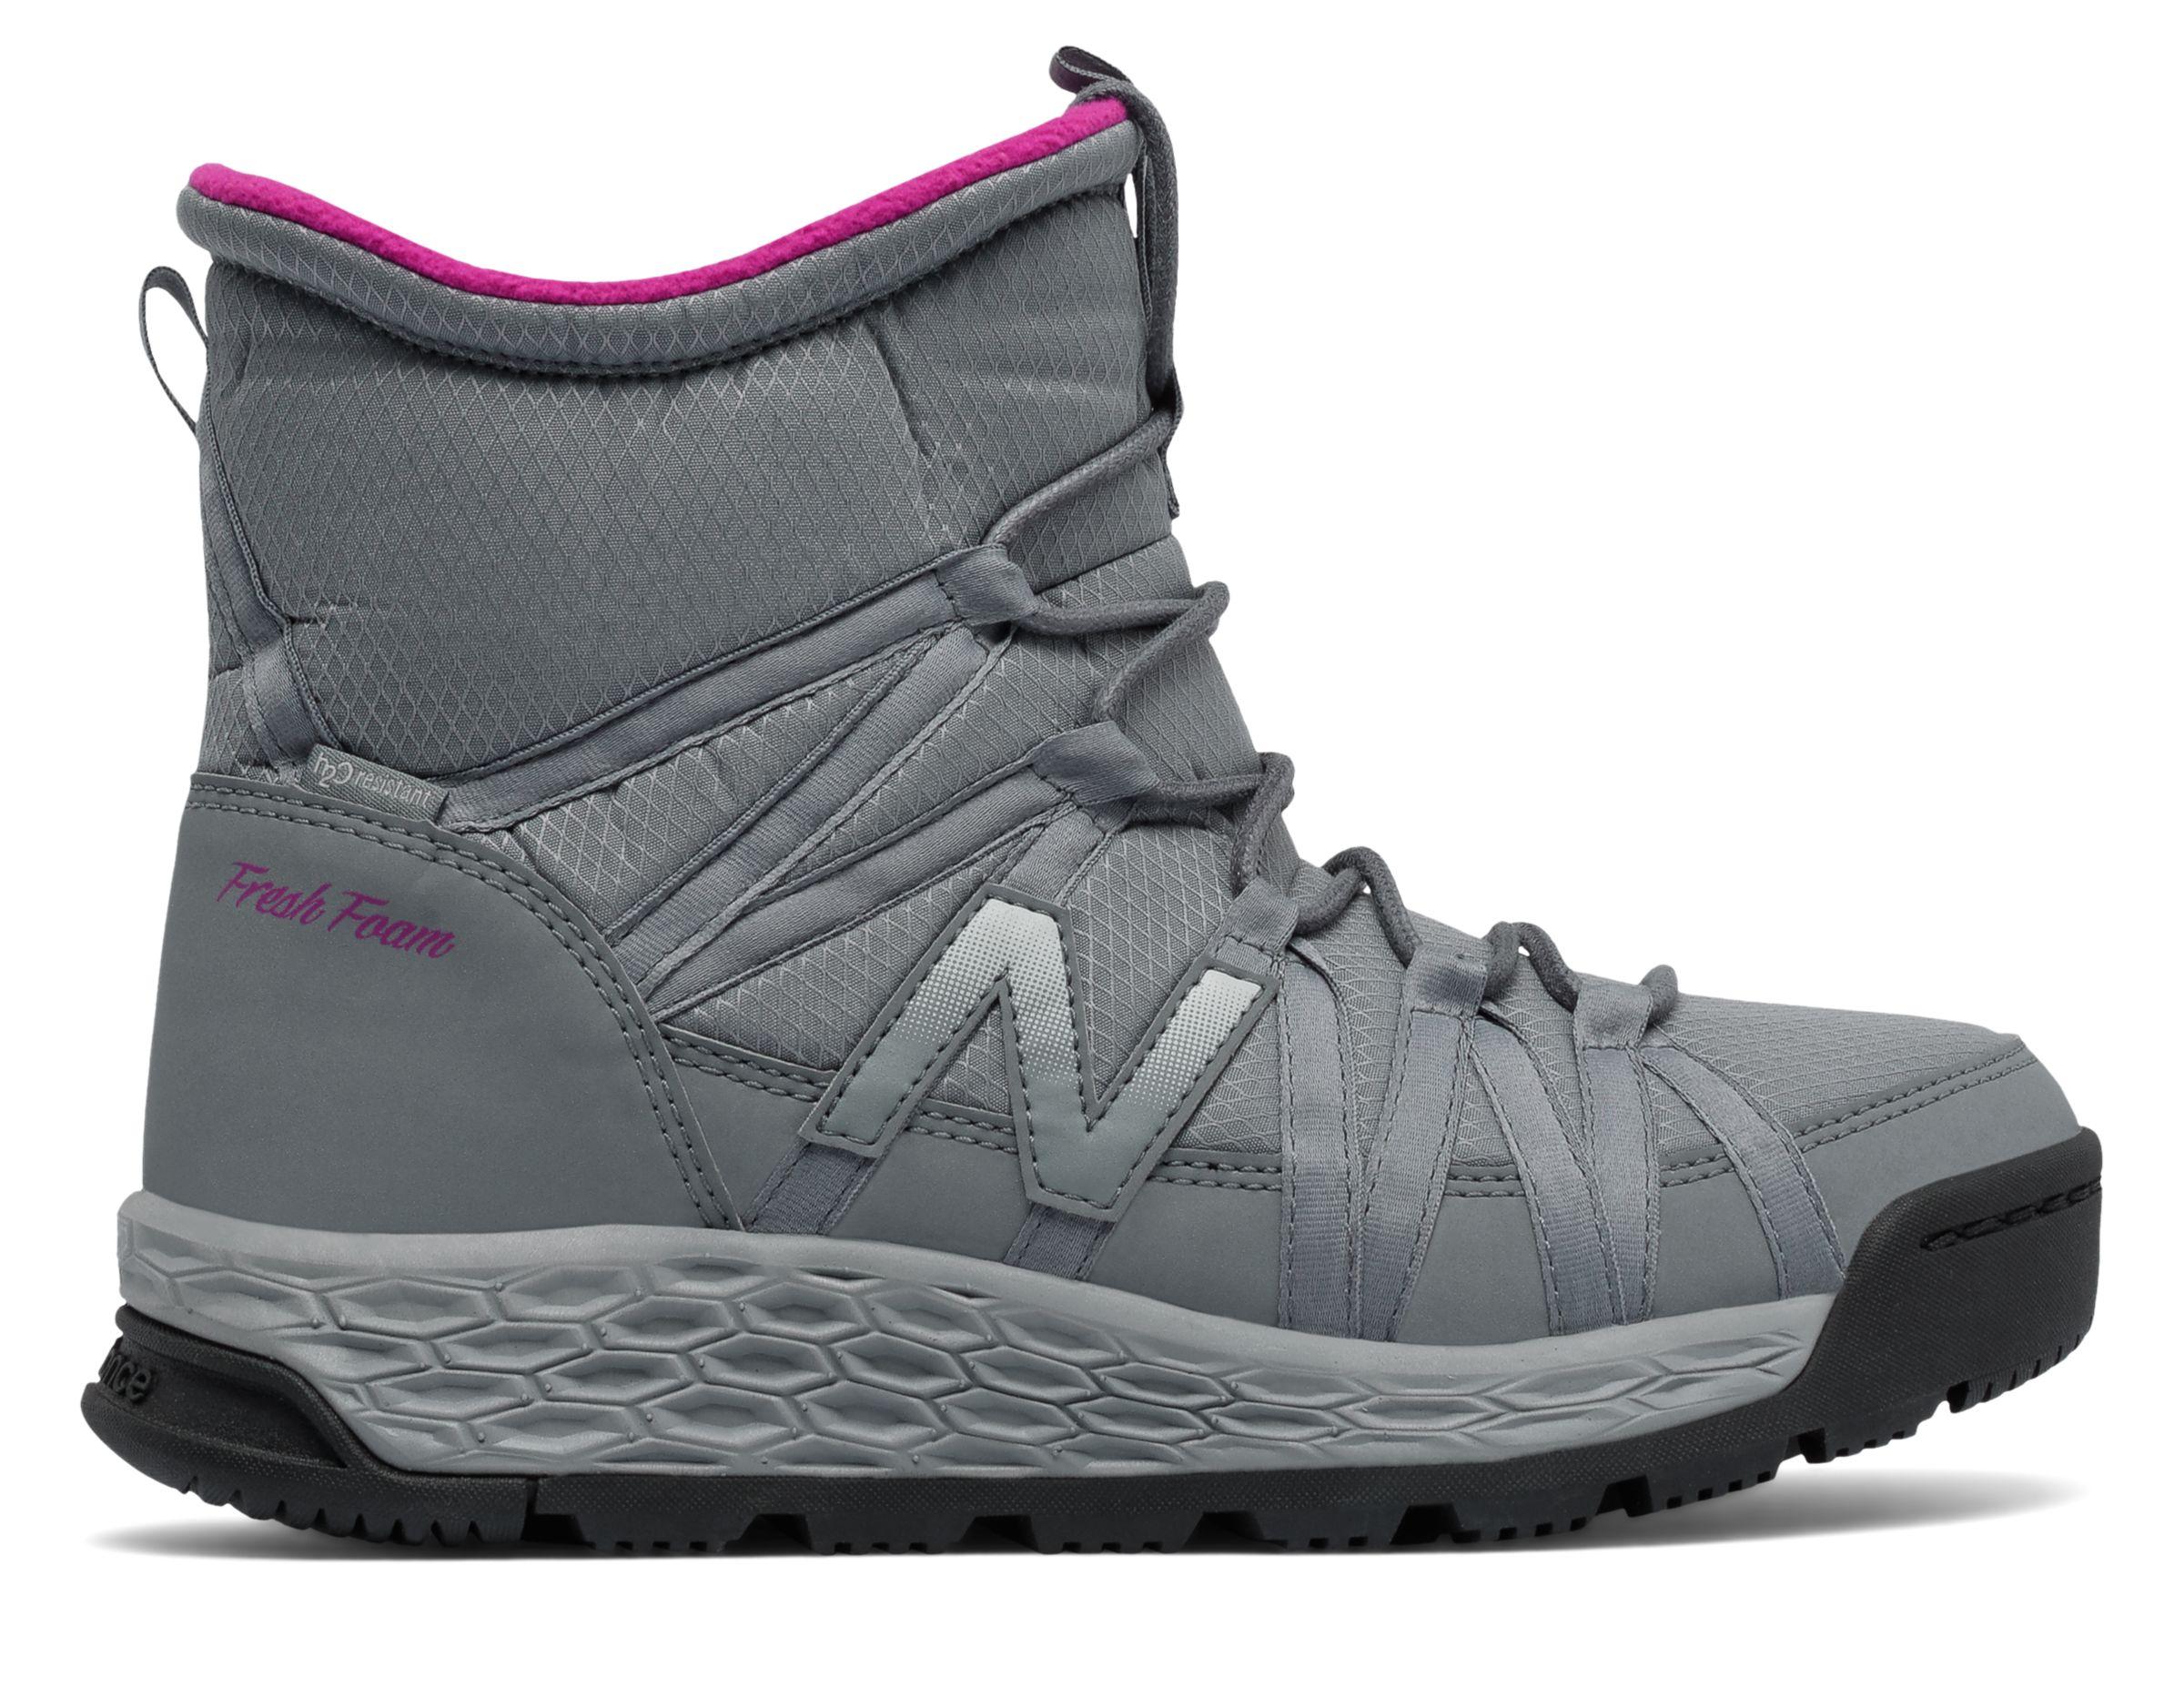 New Balance : Fresh Foam 2000 Boot : Women's Hiking & Walking : BW2000GR